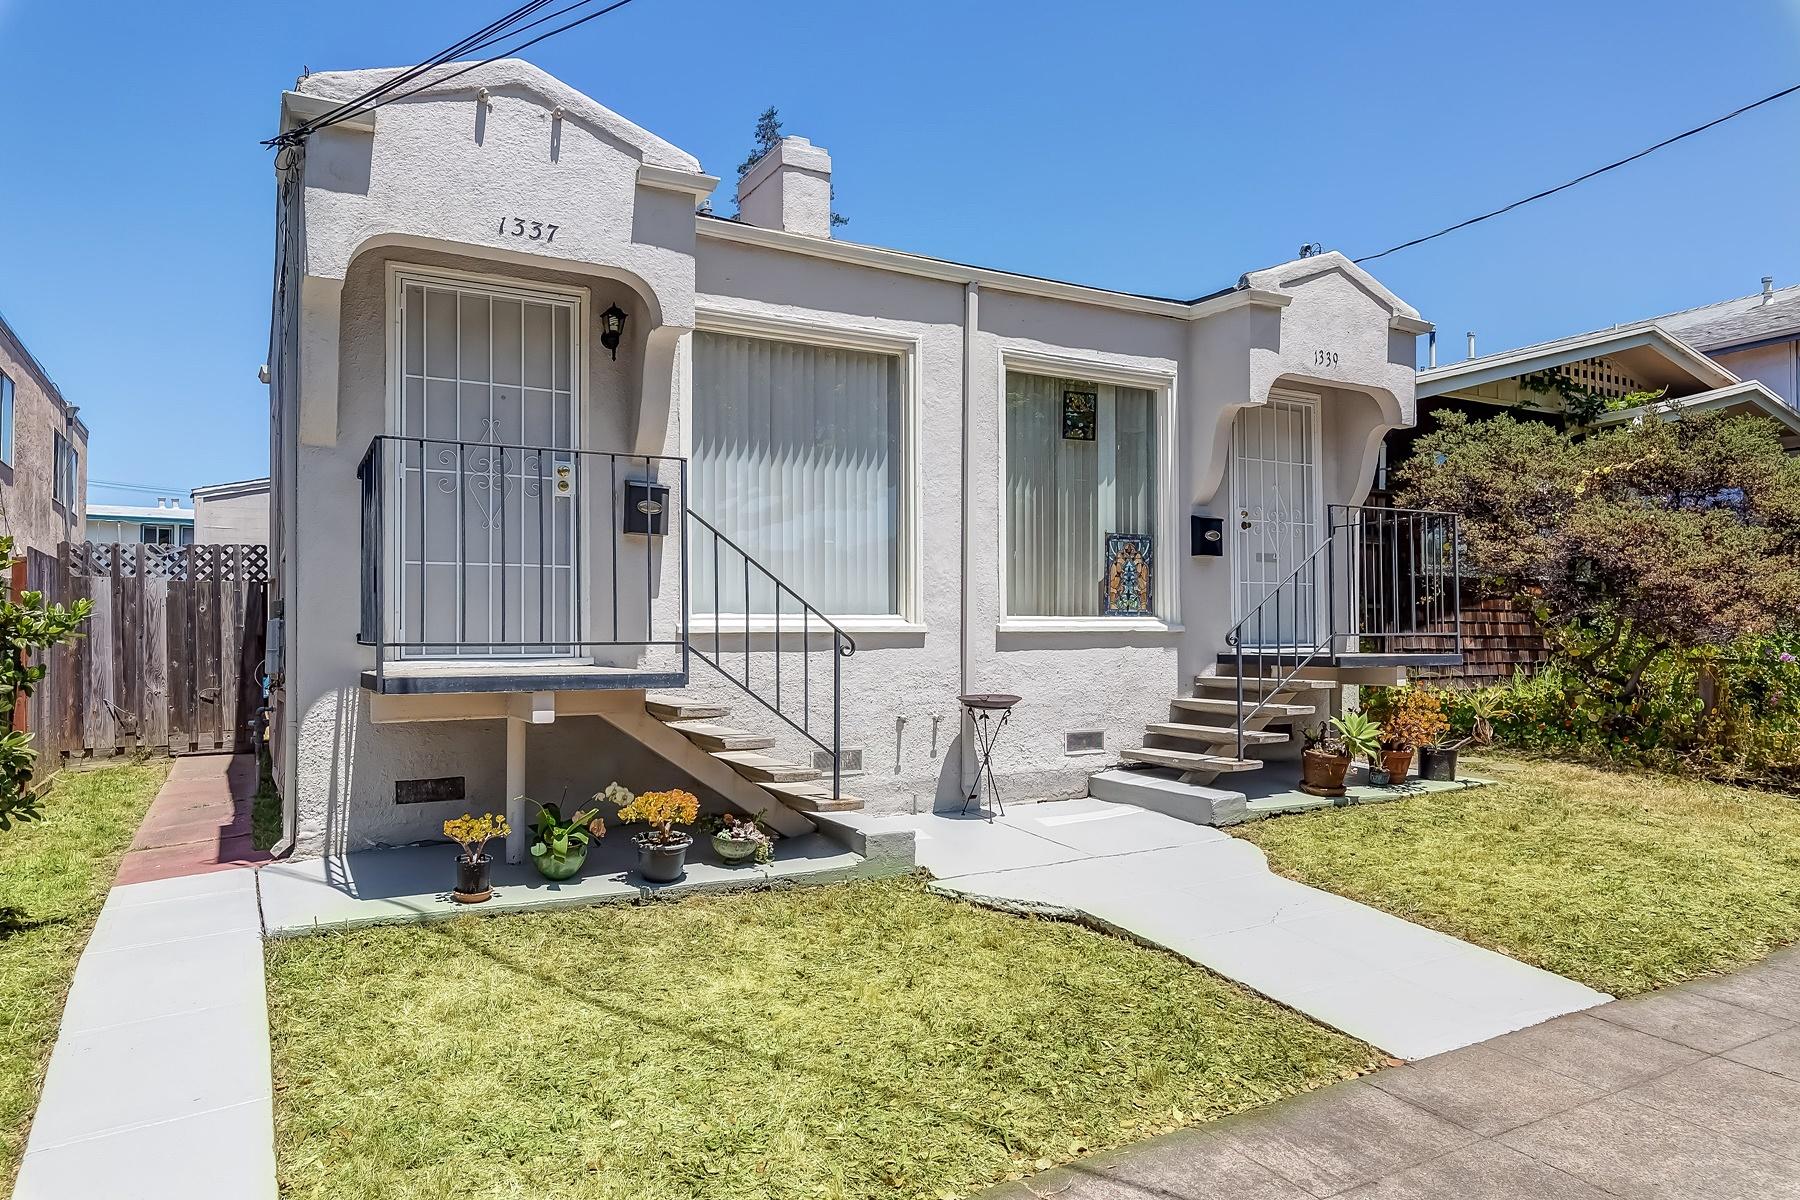 Duplex for Sale at Darling Duplex In Desirable Berkeley 1337 Hearst Avenue Berkeley, California 94702 United States